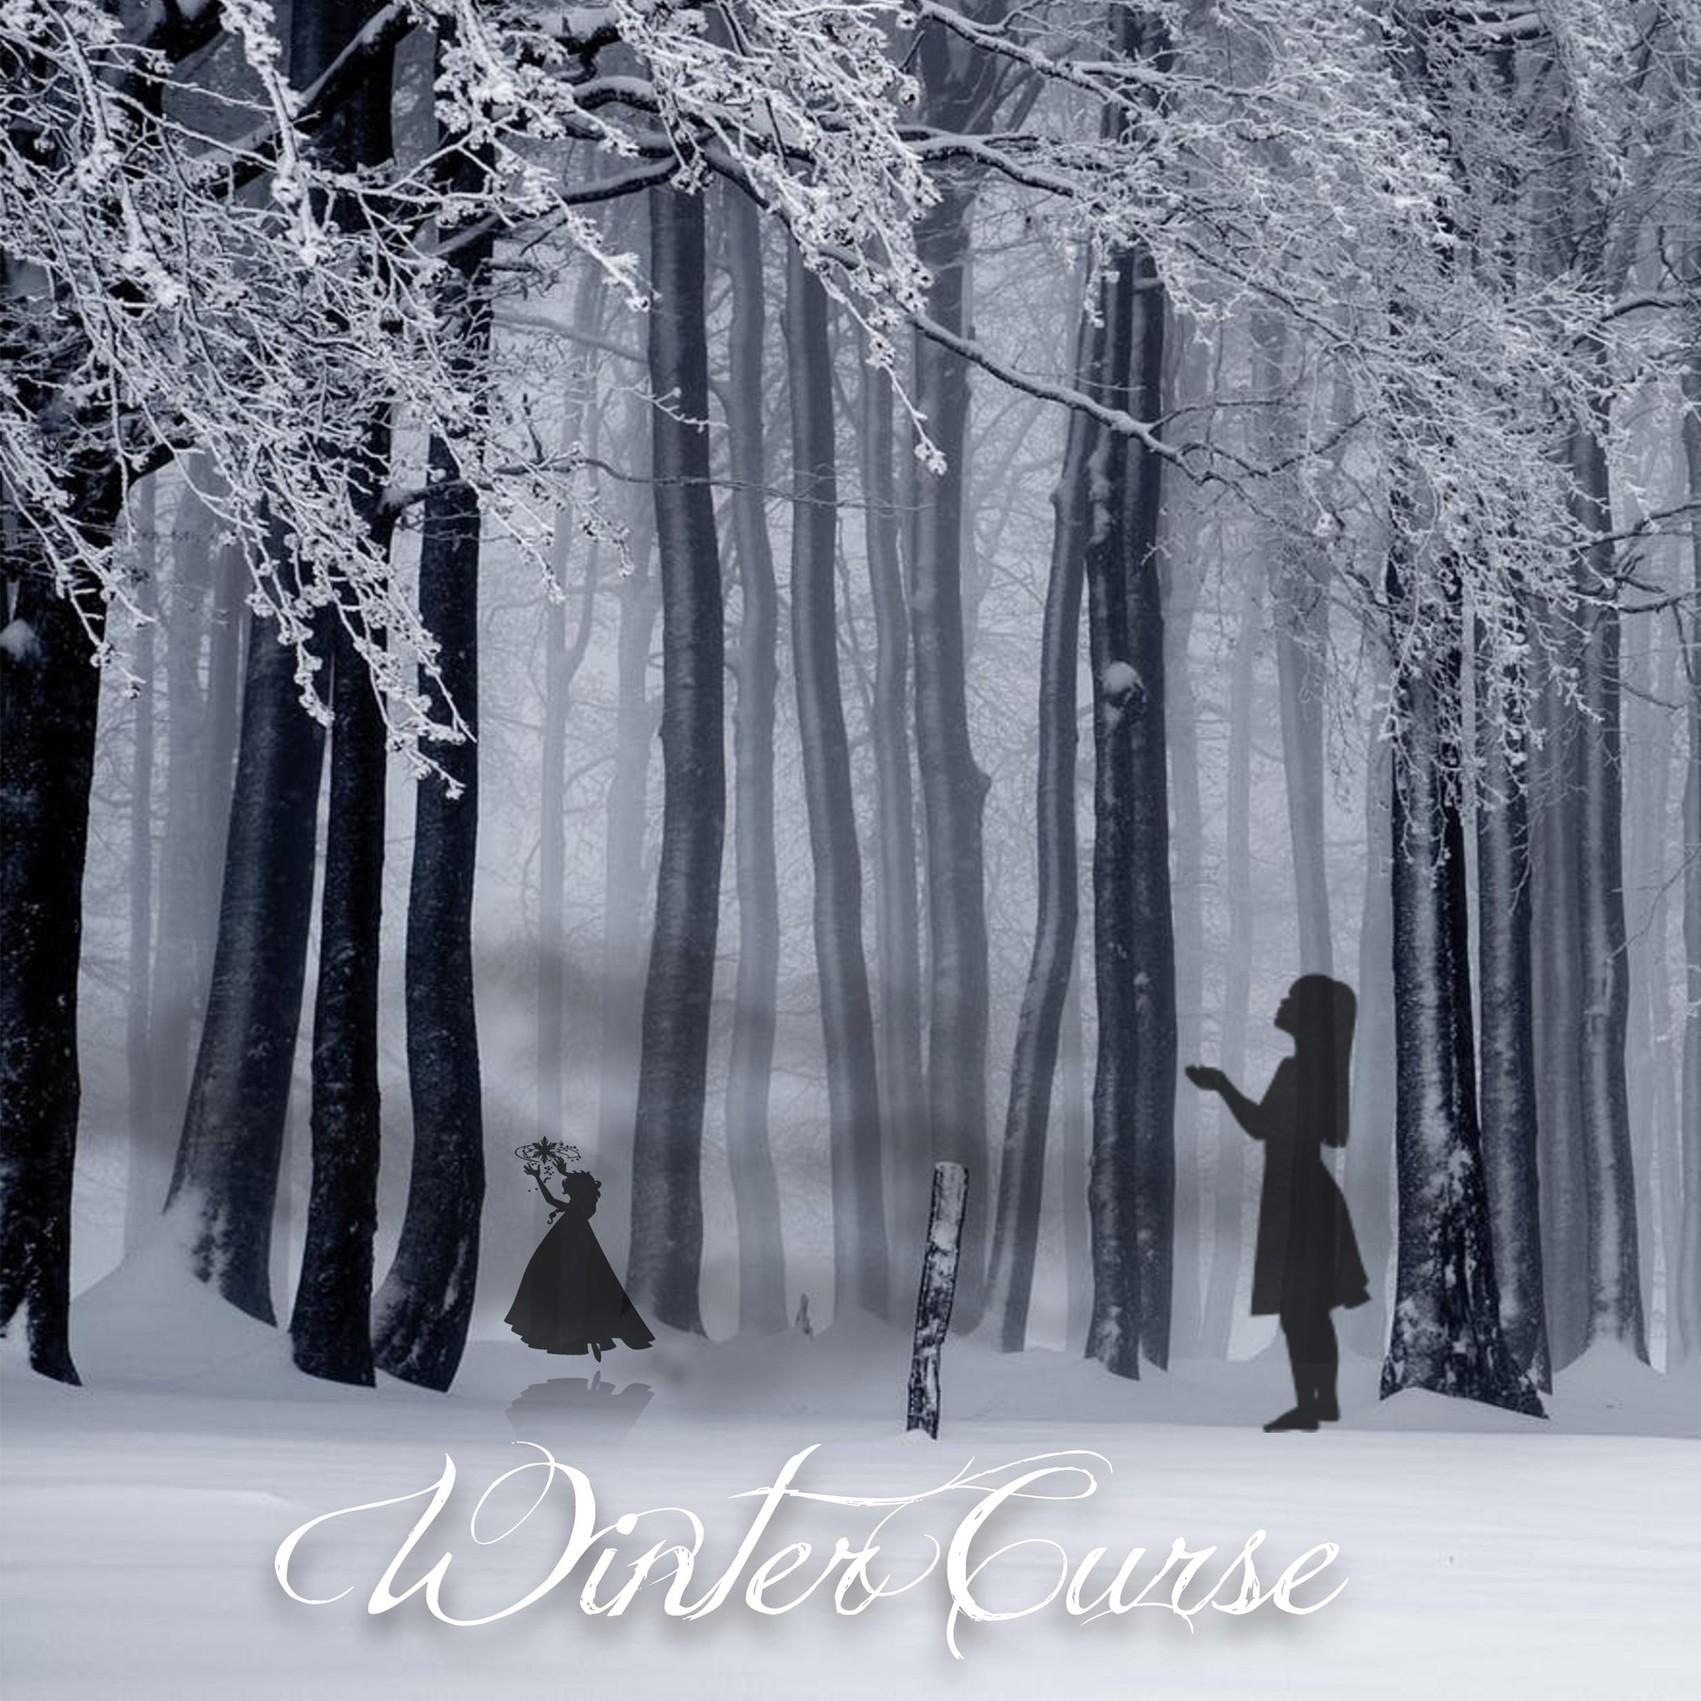 Winter Curse